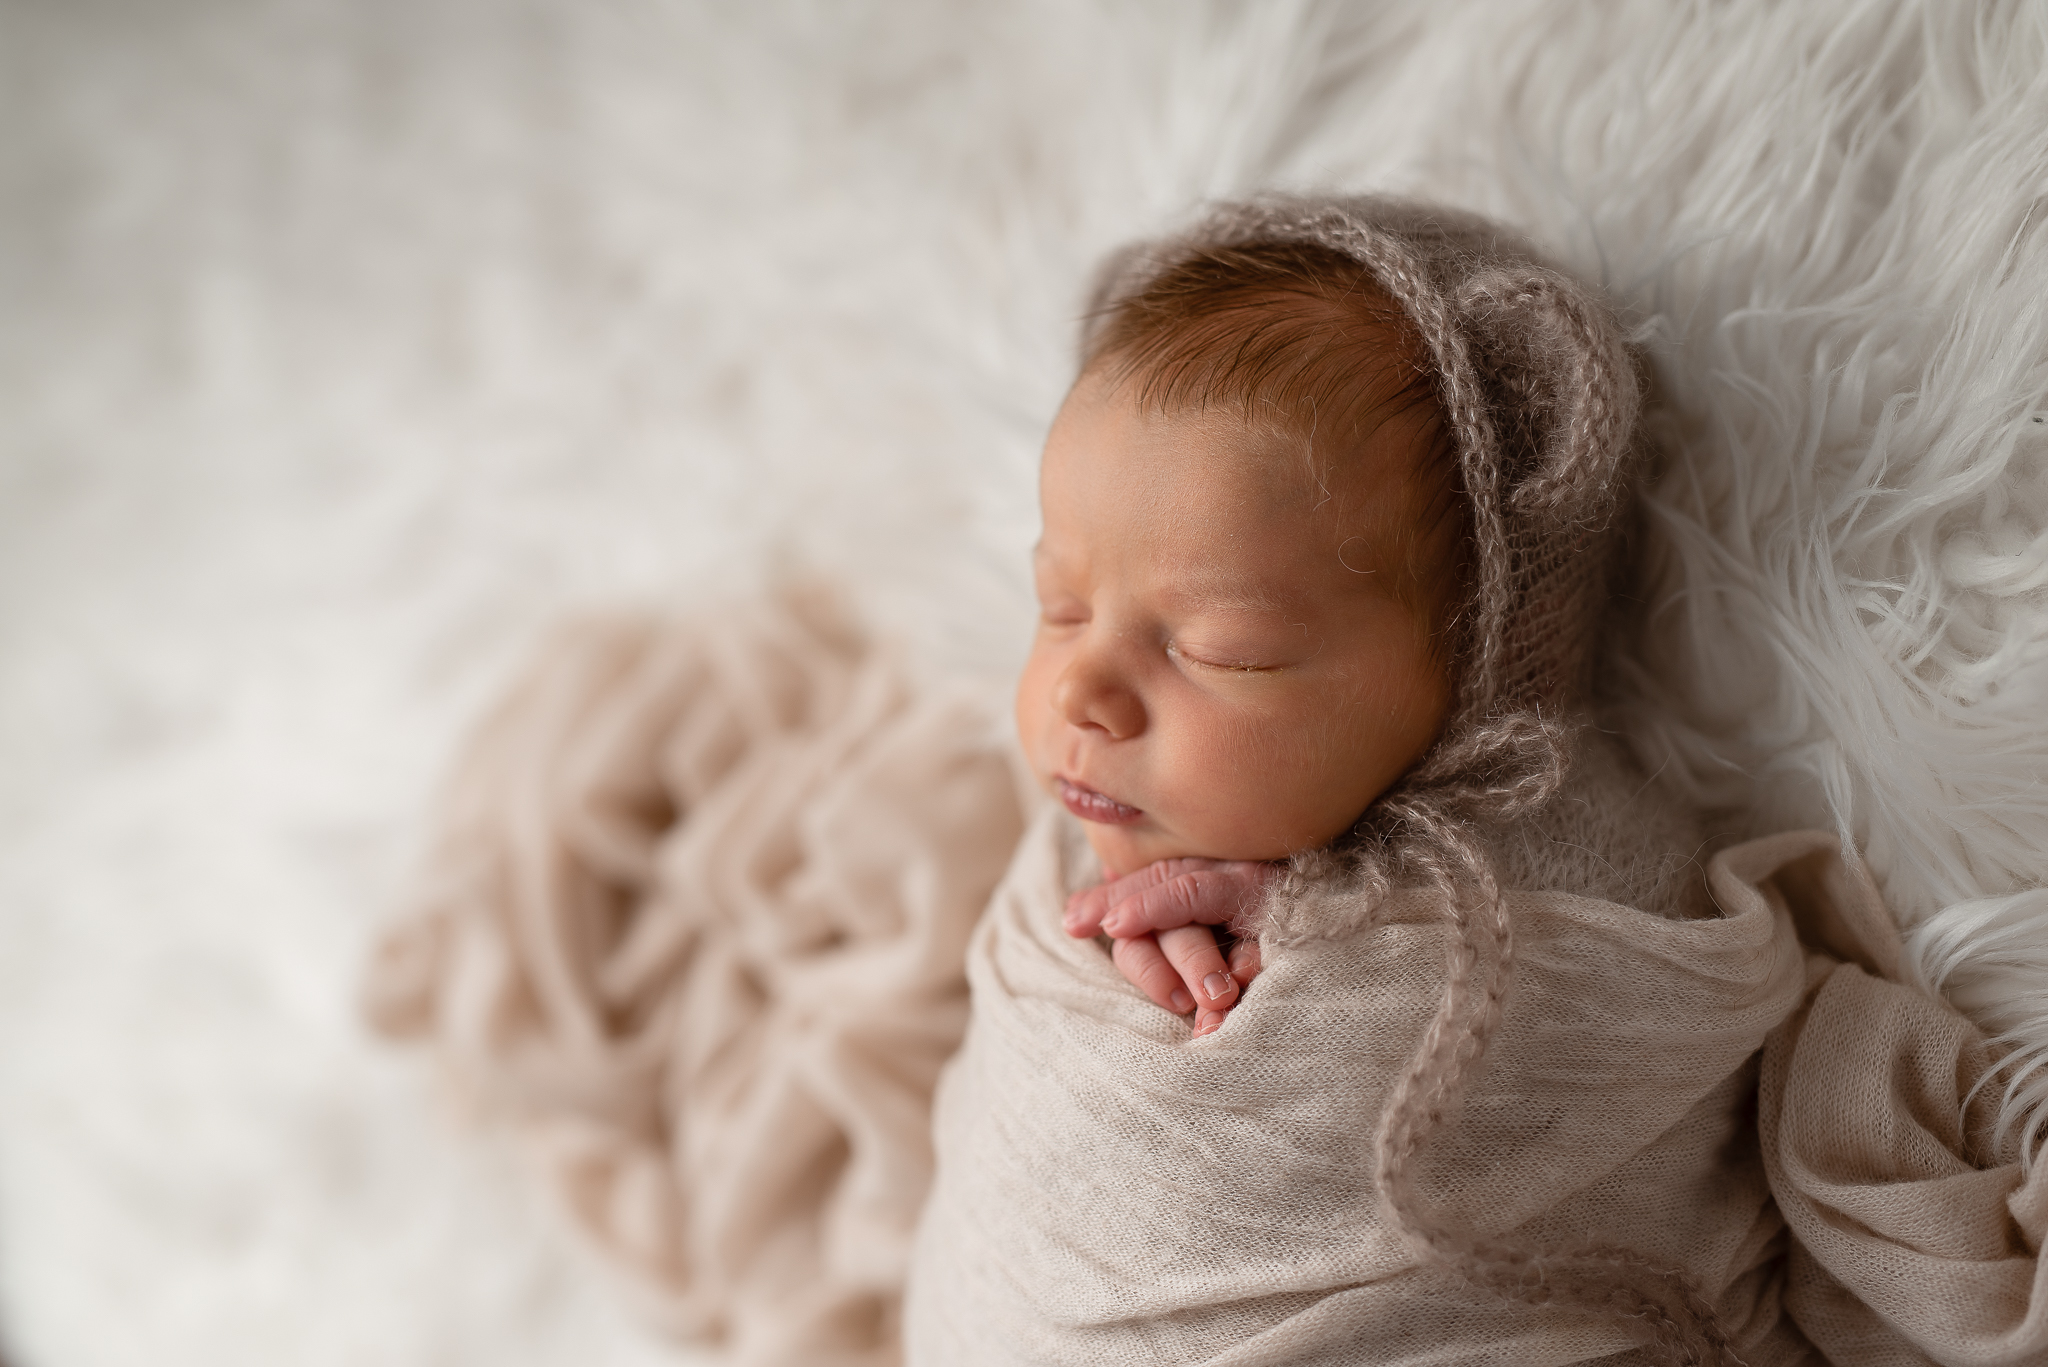 Newborn34NaomiLuciennePhotography062019-Edit-2.jpg